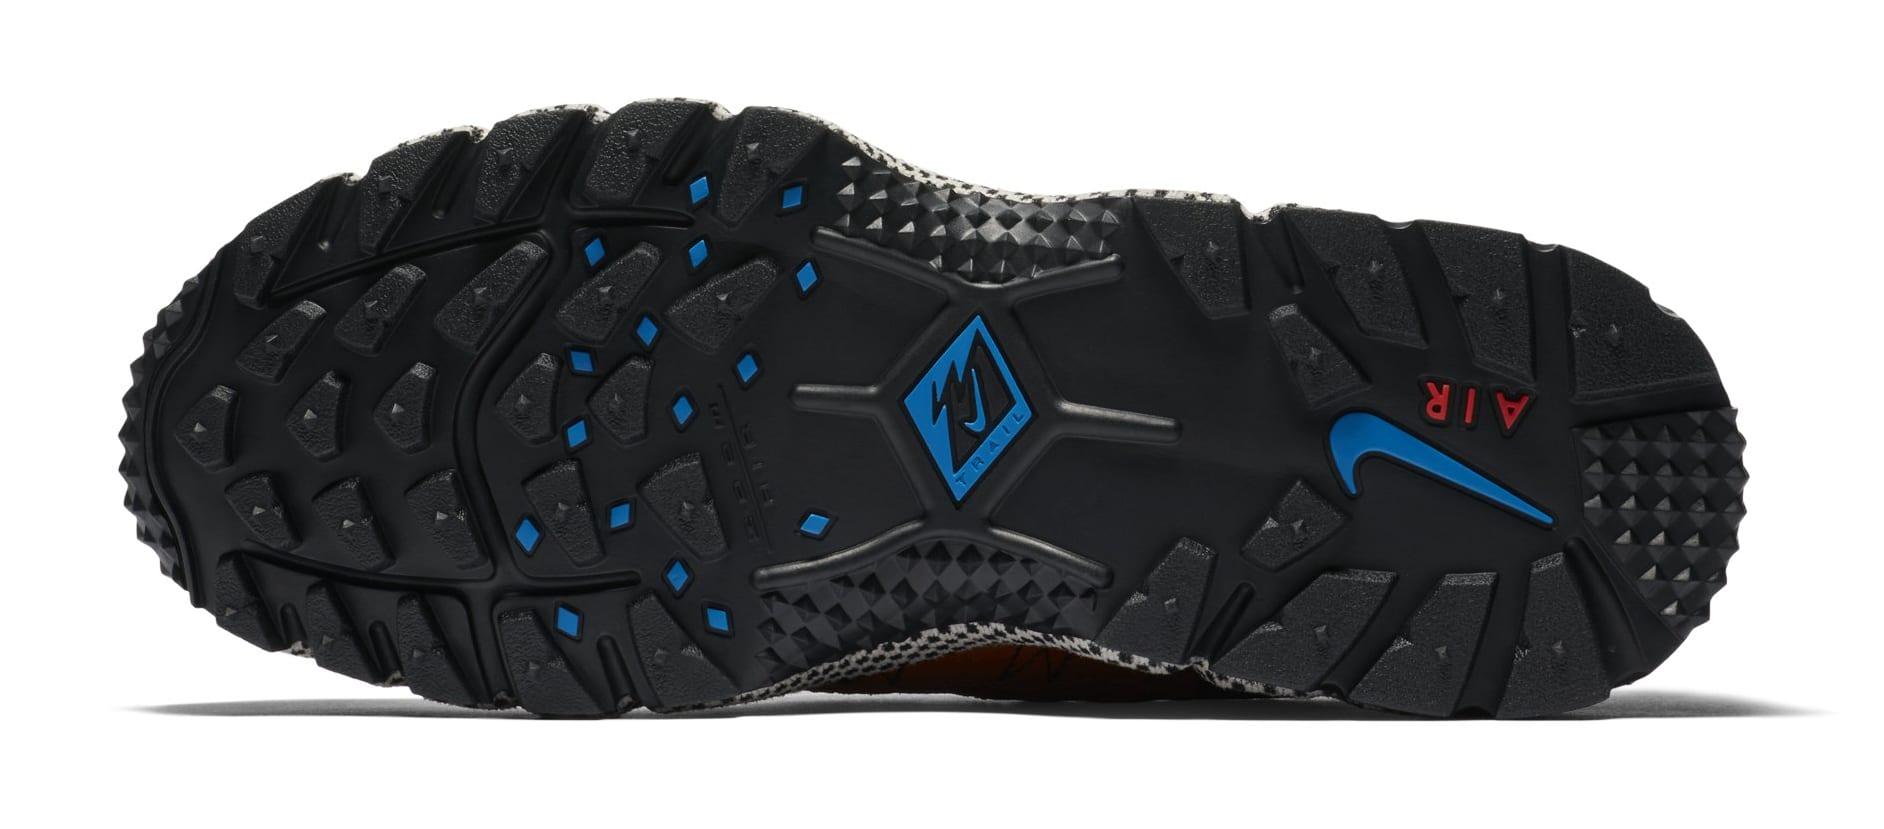 Nike Air Humara 'Dark Russet' AO3297-200 (Bottom)